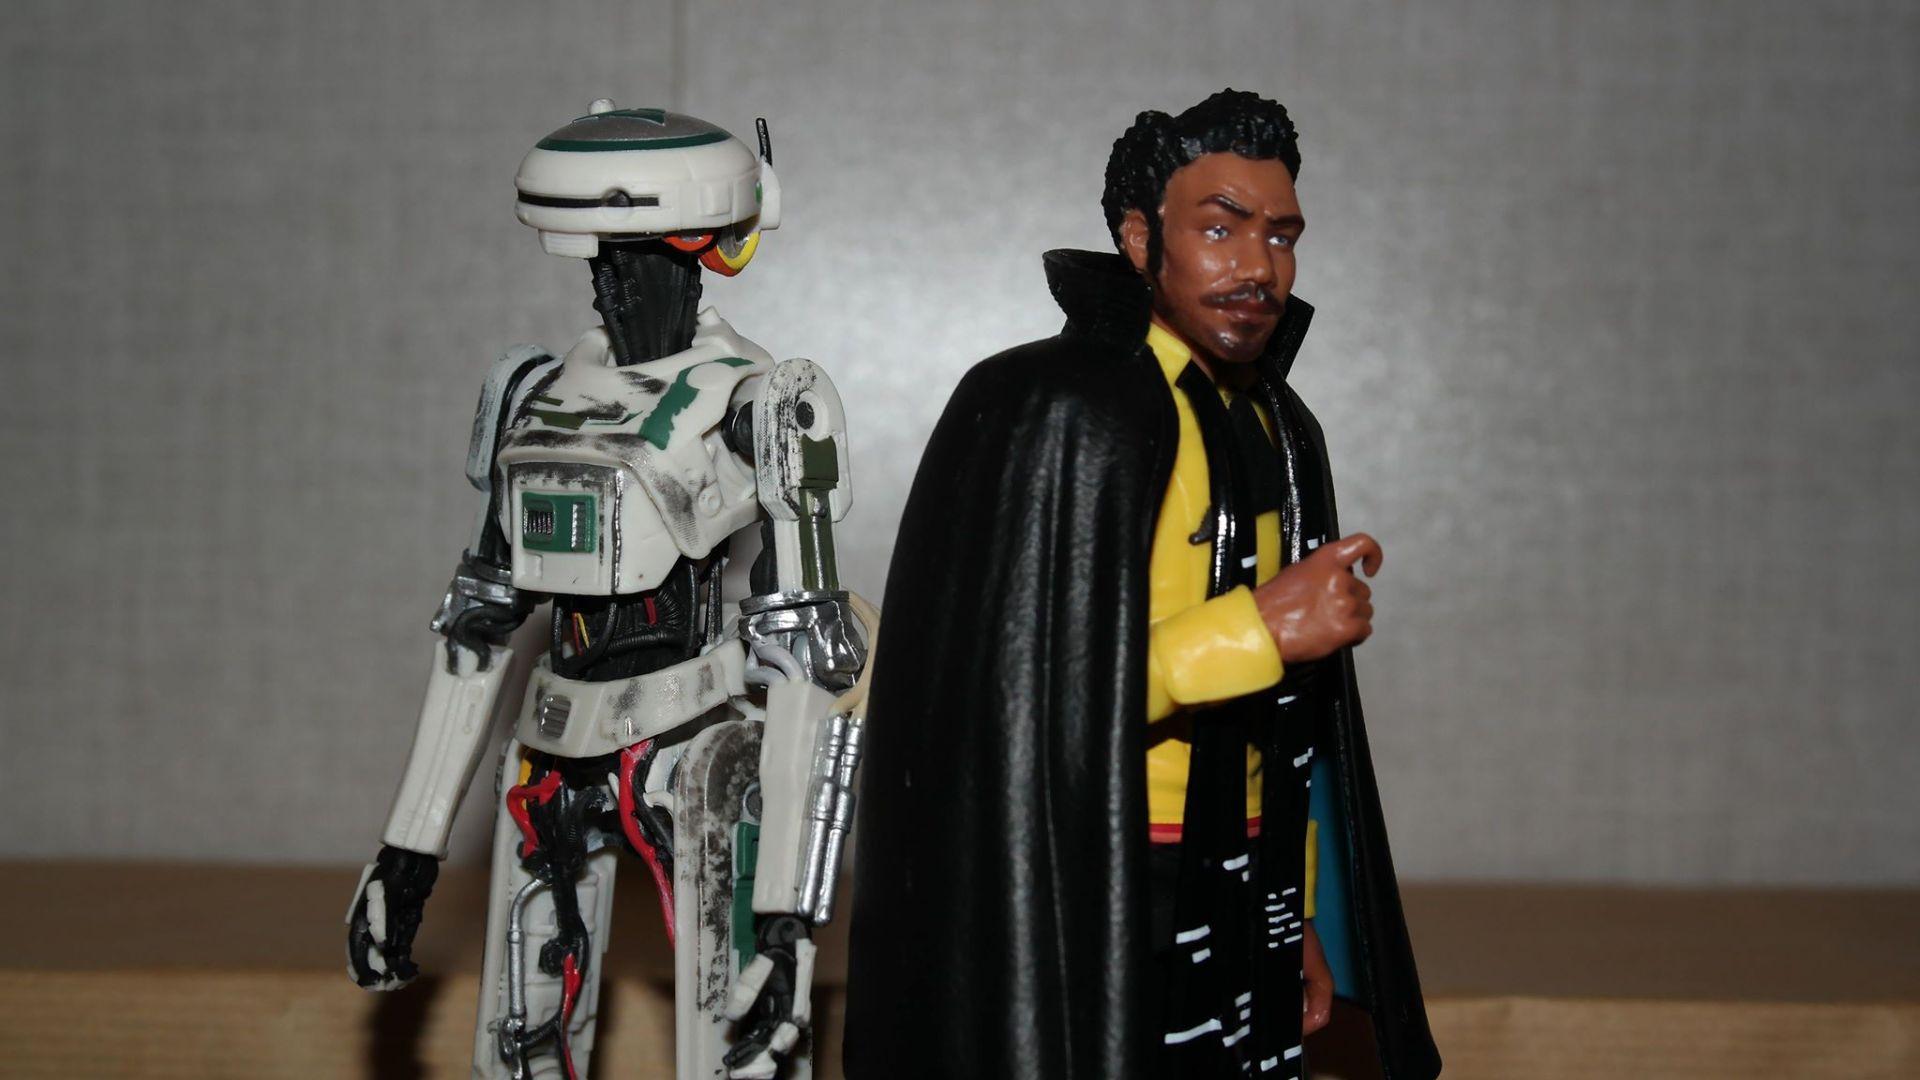 Star-Wars-Black-Series-L3-37-Review-13